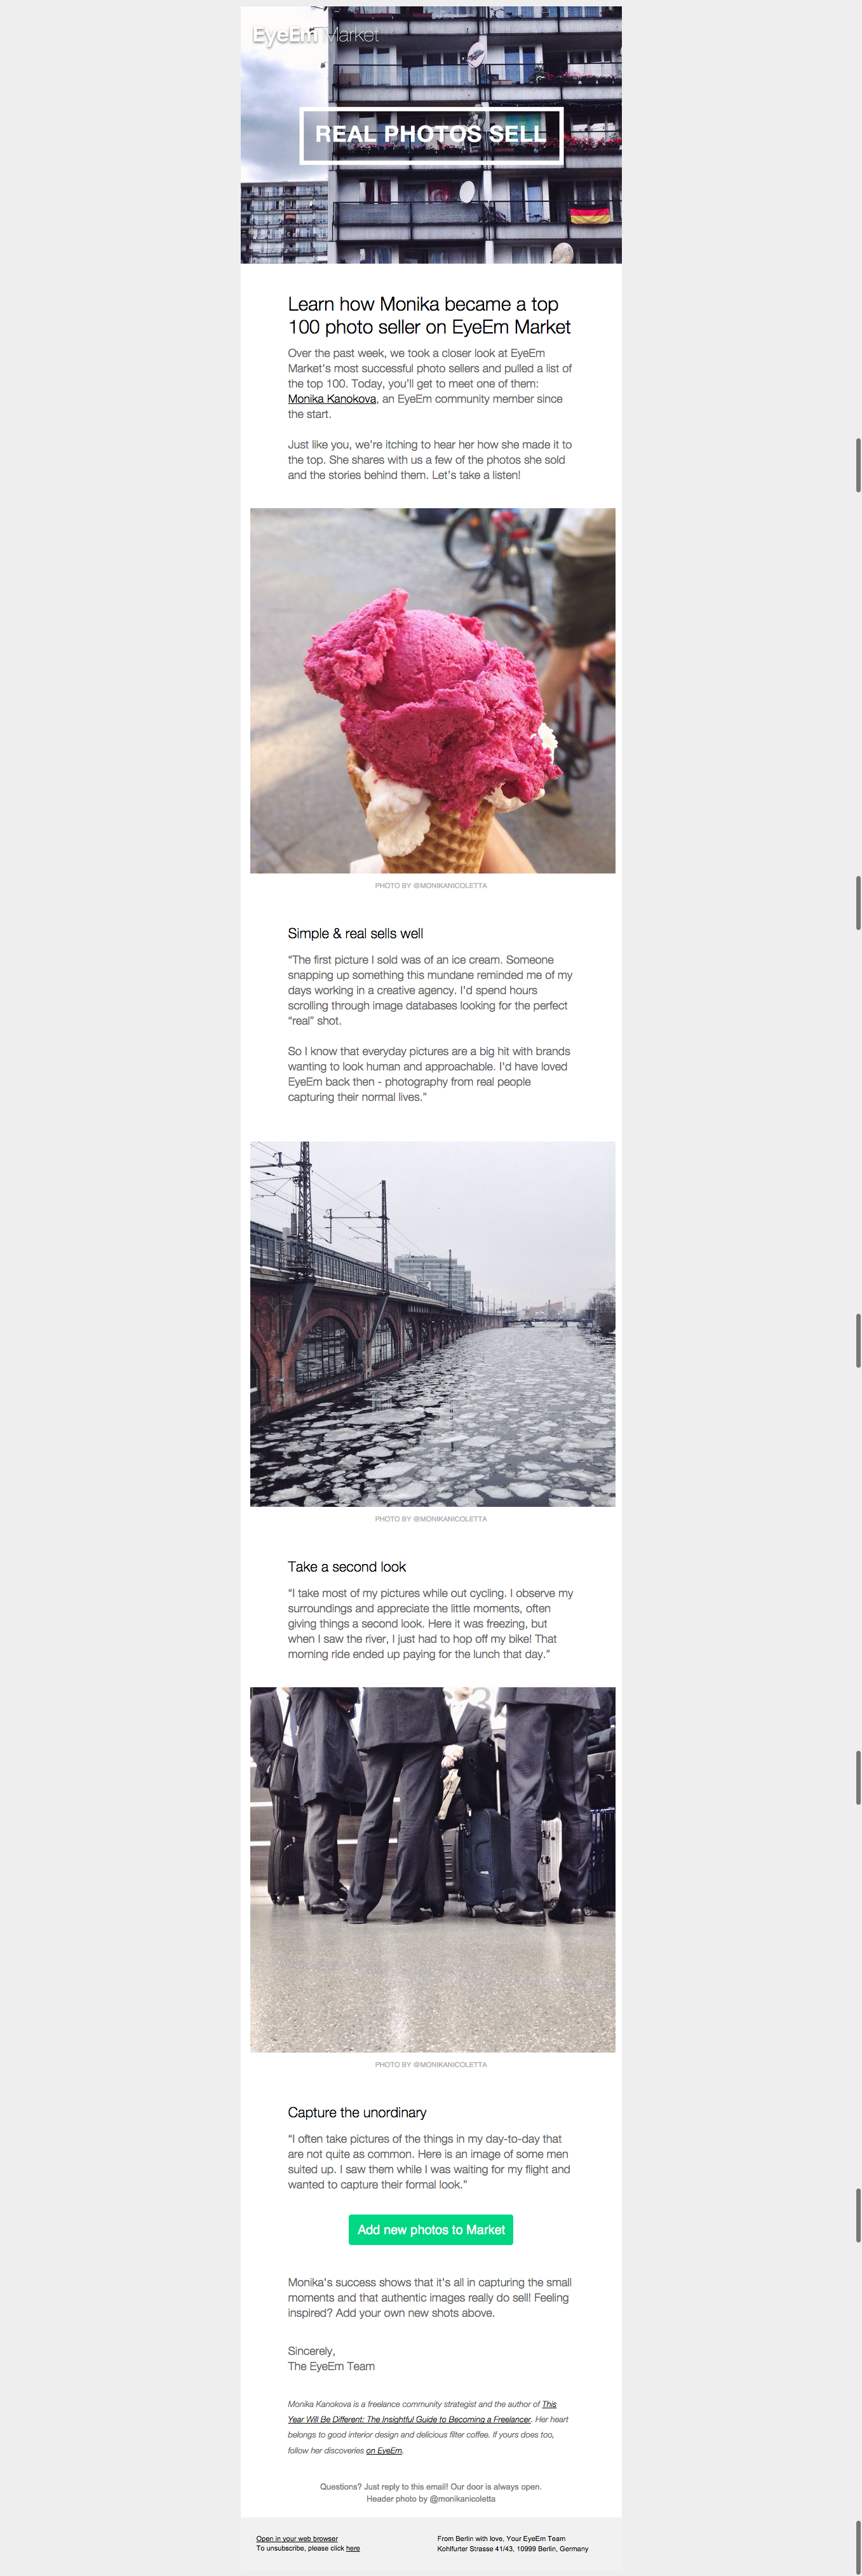 eyeem newsletter